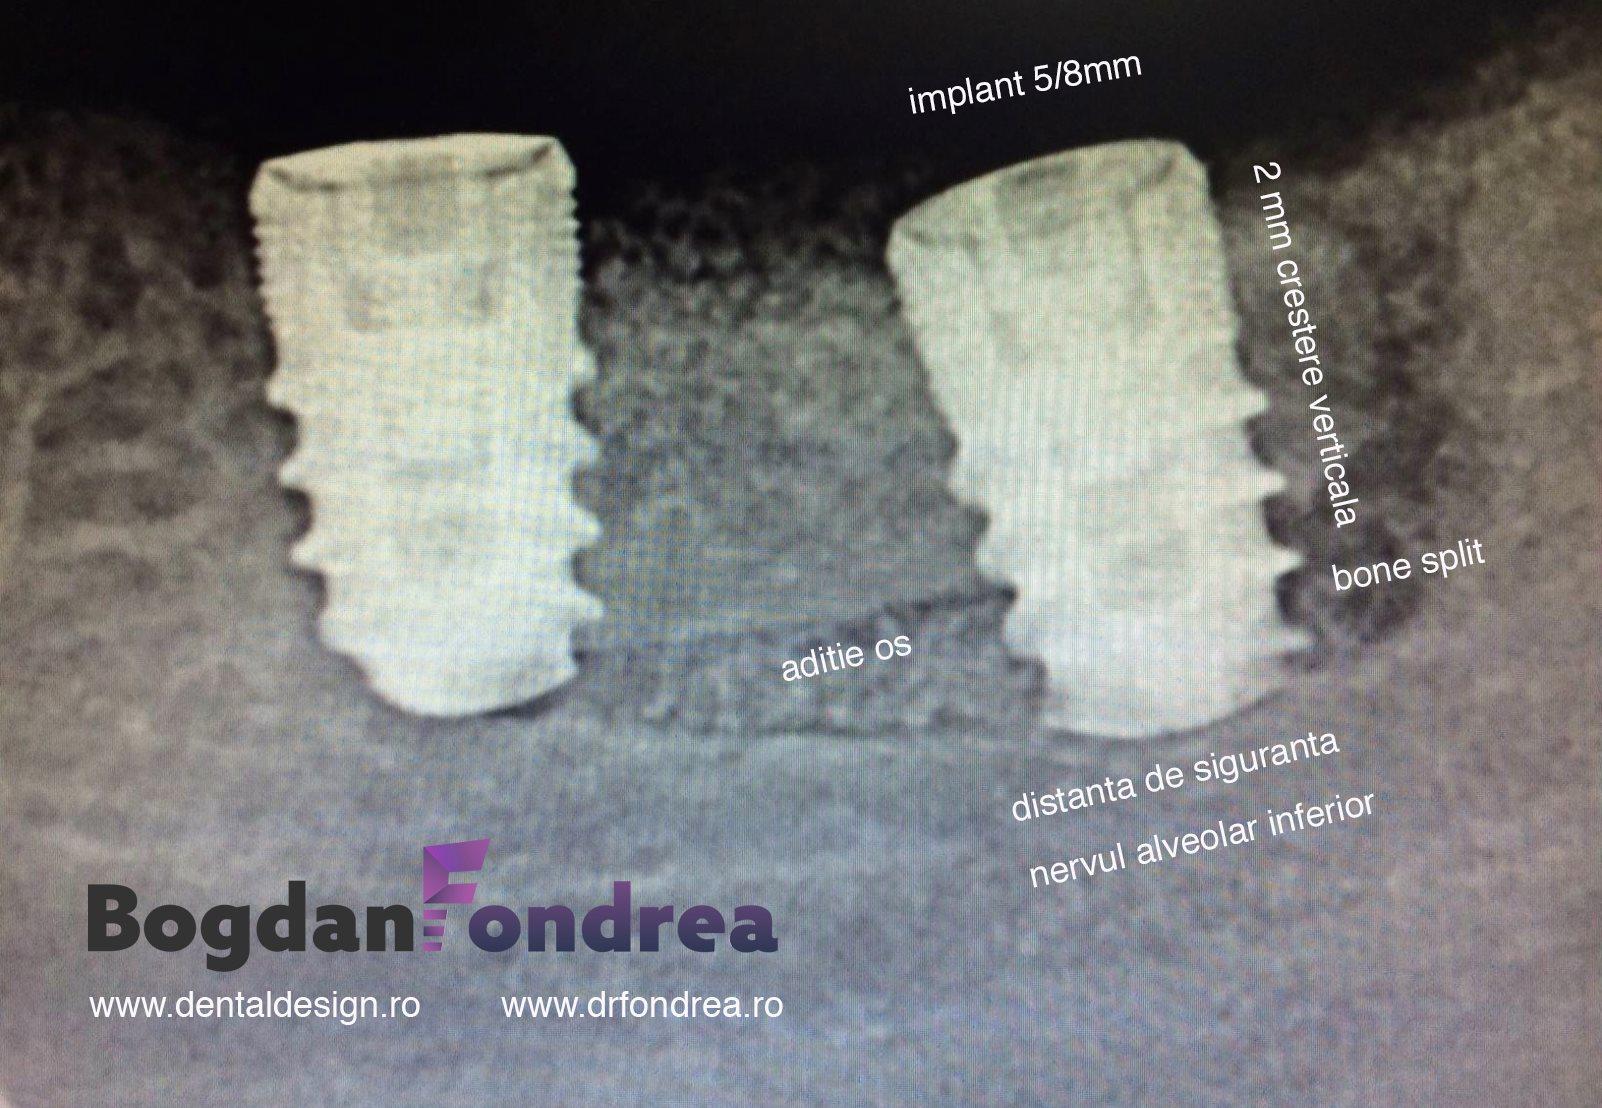 bone split implanturi bogdan fondrea